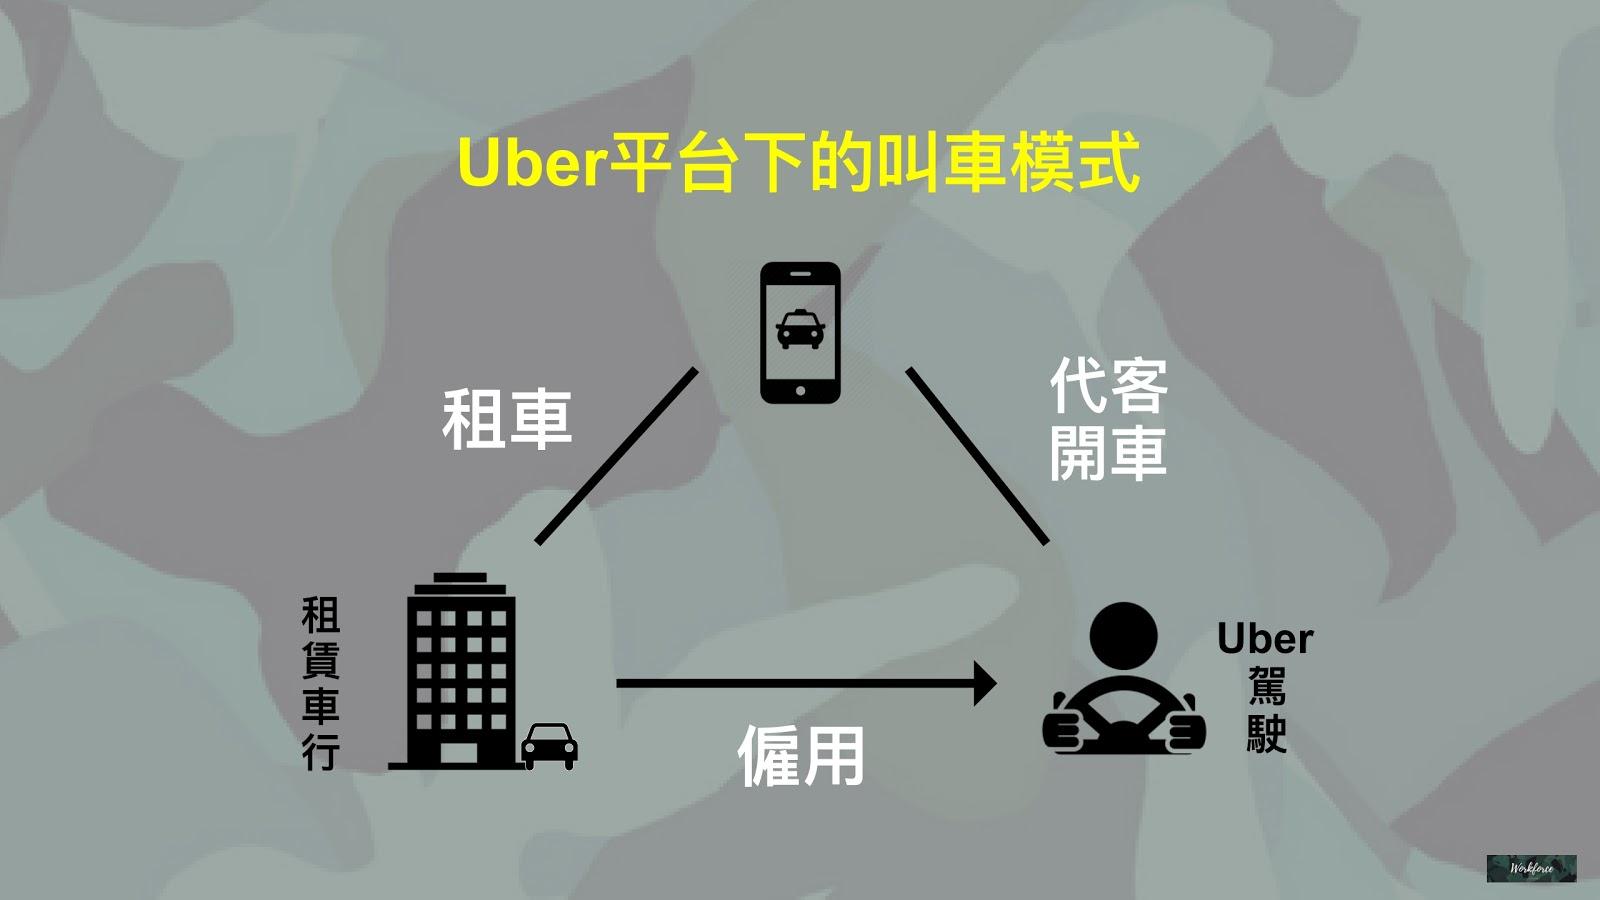 Uber平台下的叫車模式